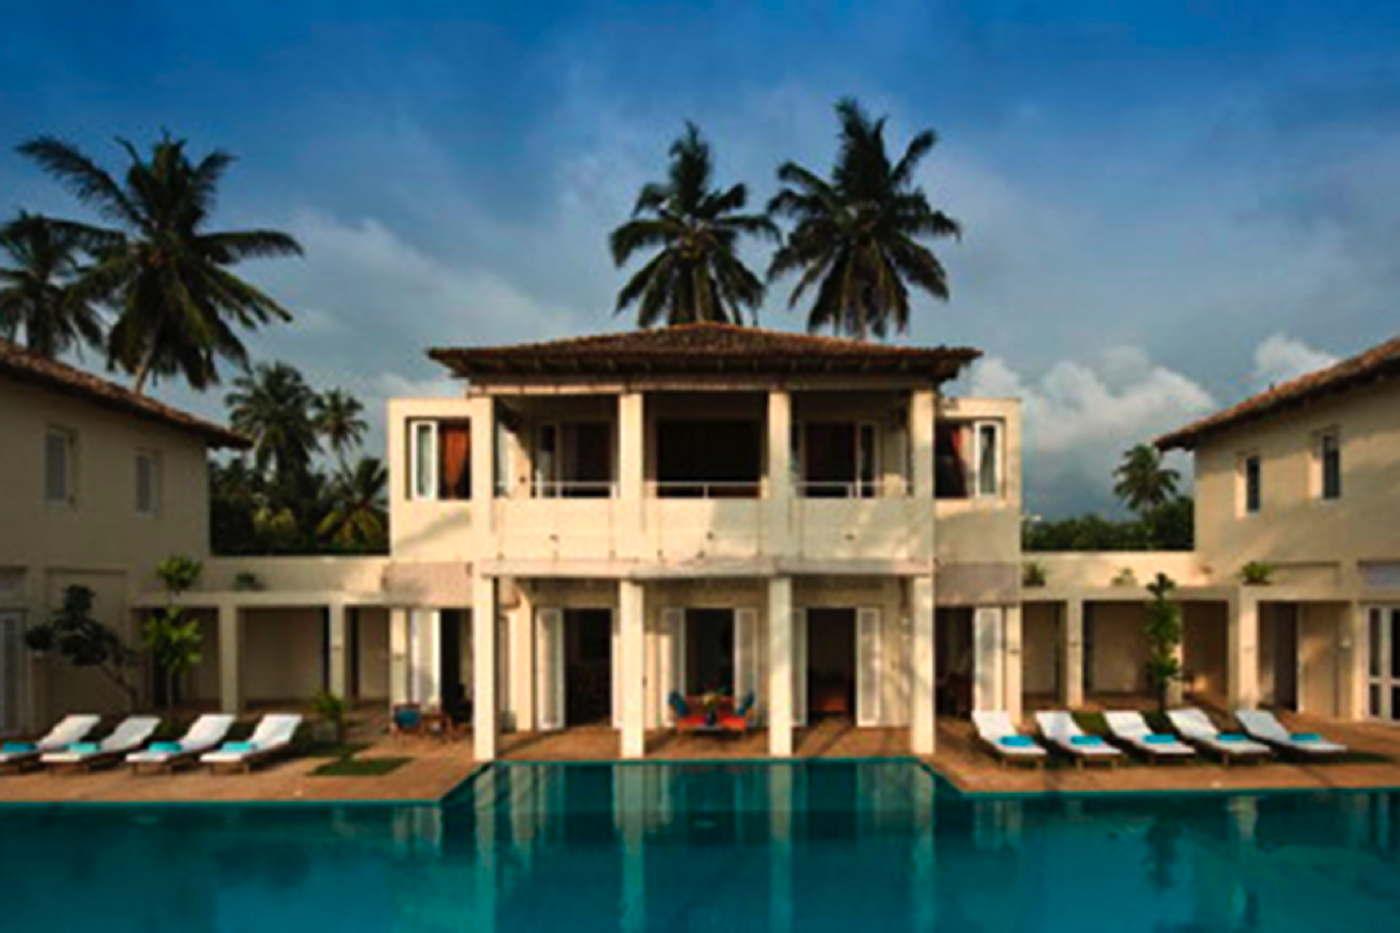 ferienvilla am strand mieten villa mit pool und service sri lanka induruwa. Black Bedroom Furniture Sets. Home Design Ideas